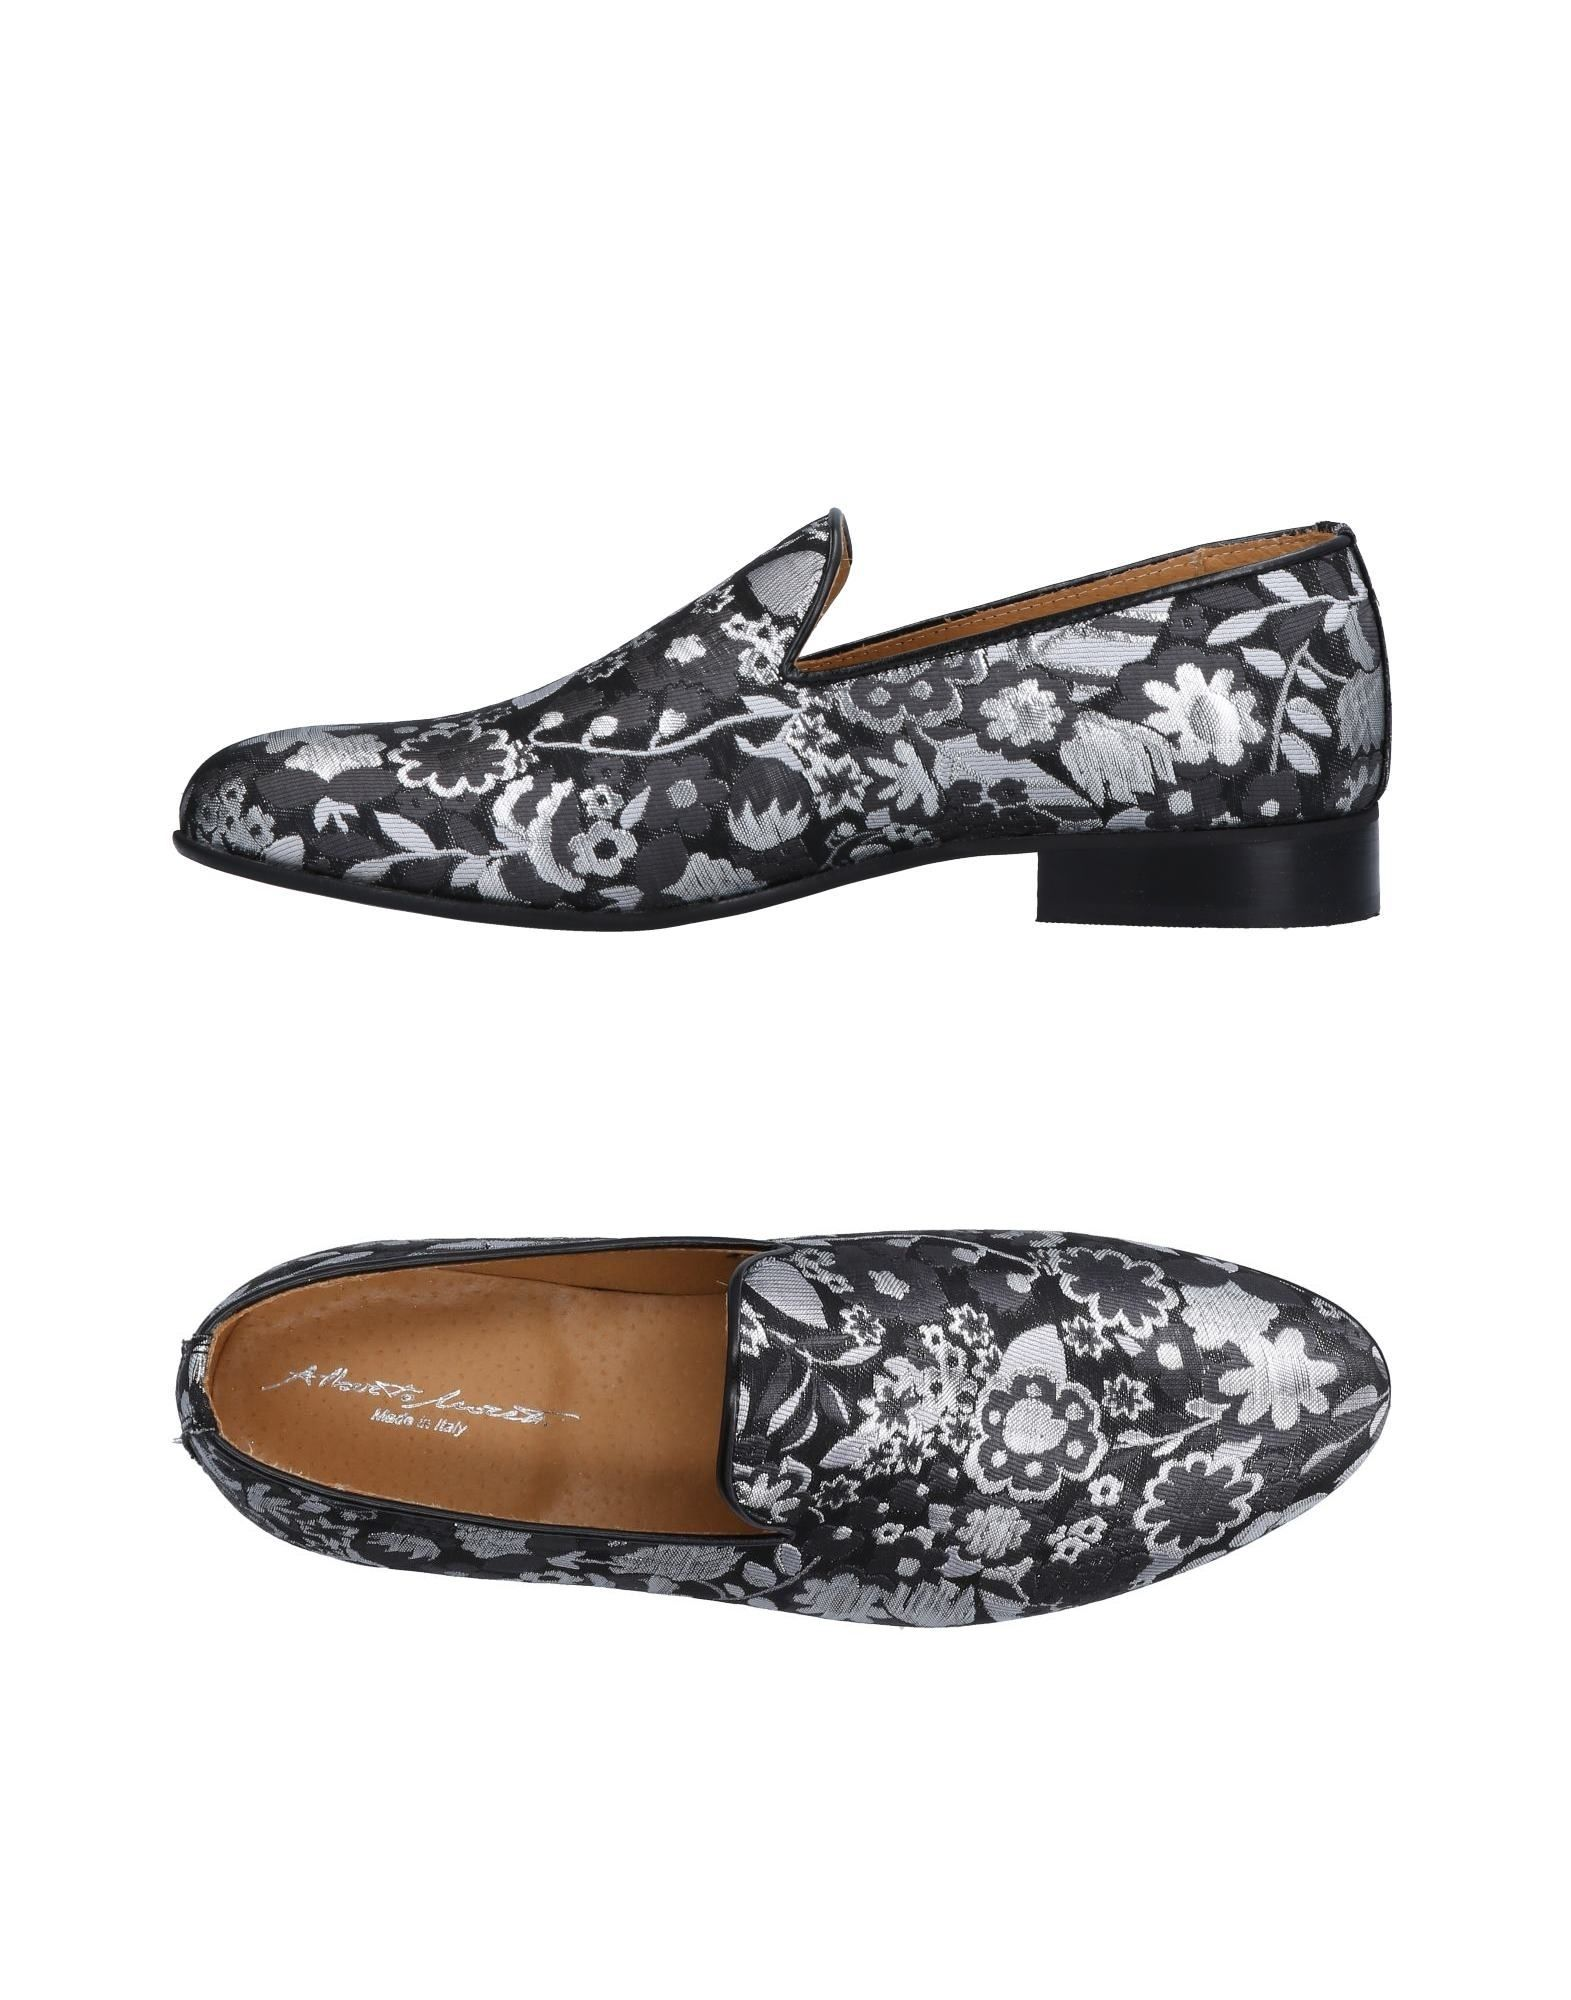 Alberto Moretti Mokassins Herren  11508887MJ Gute Qualität beliebte Schuhe